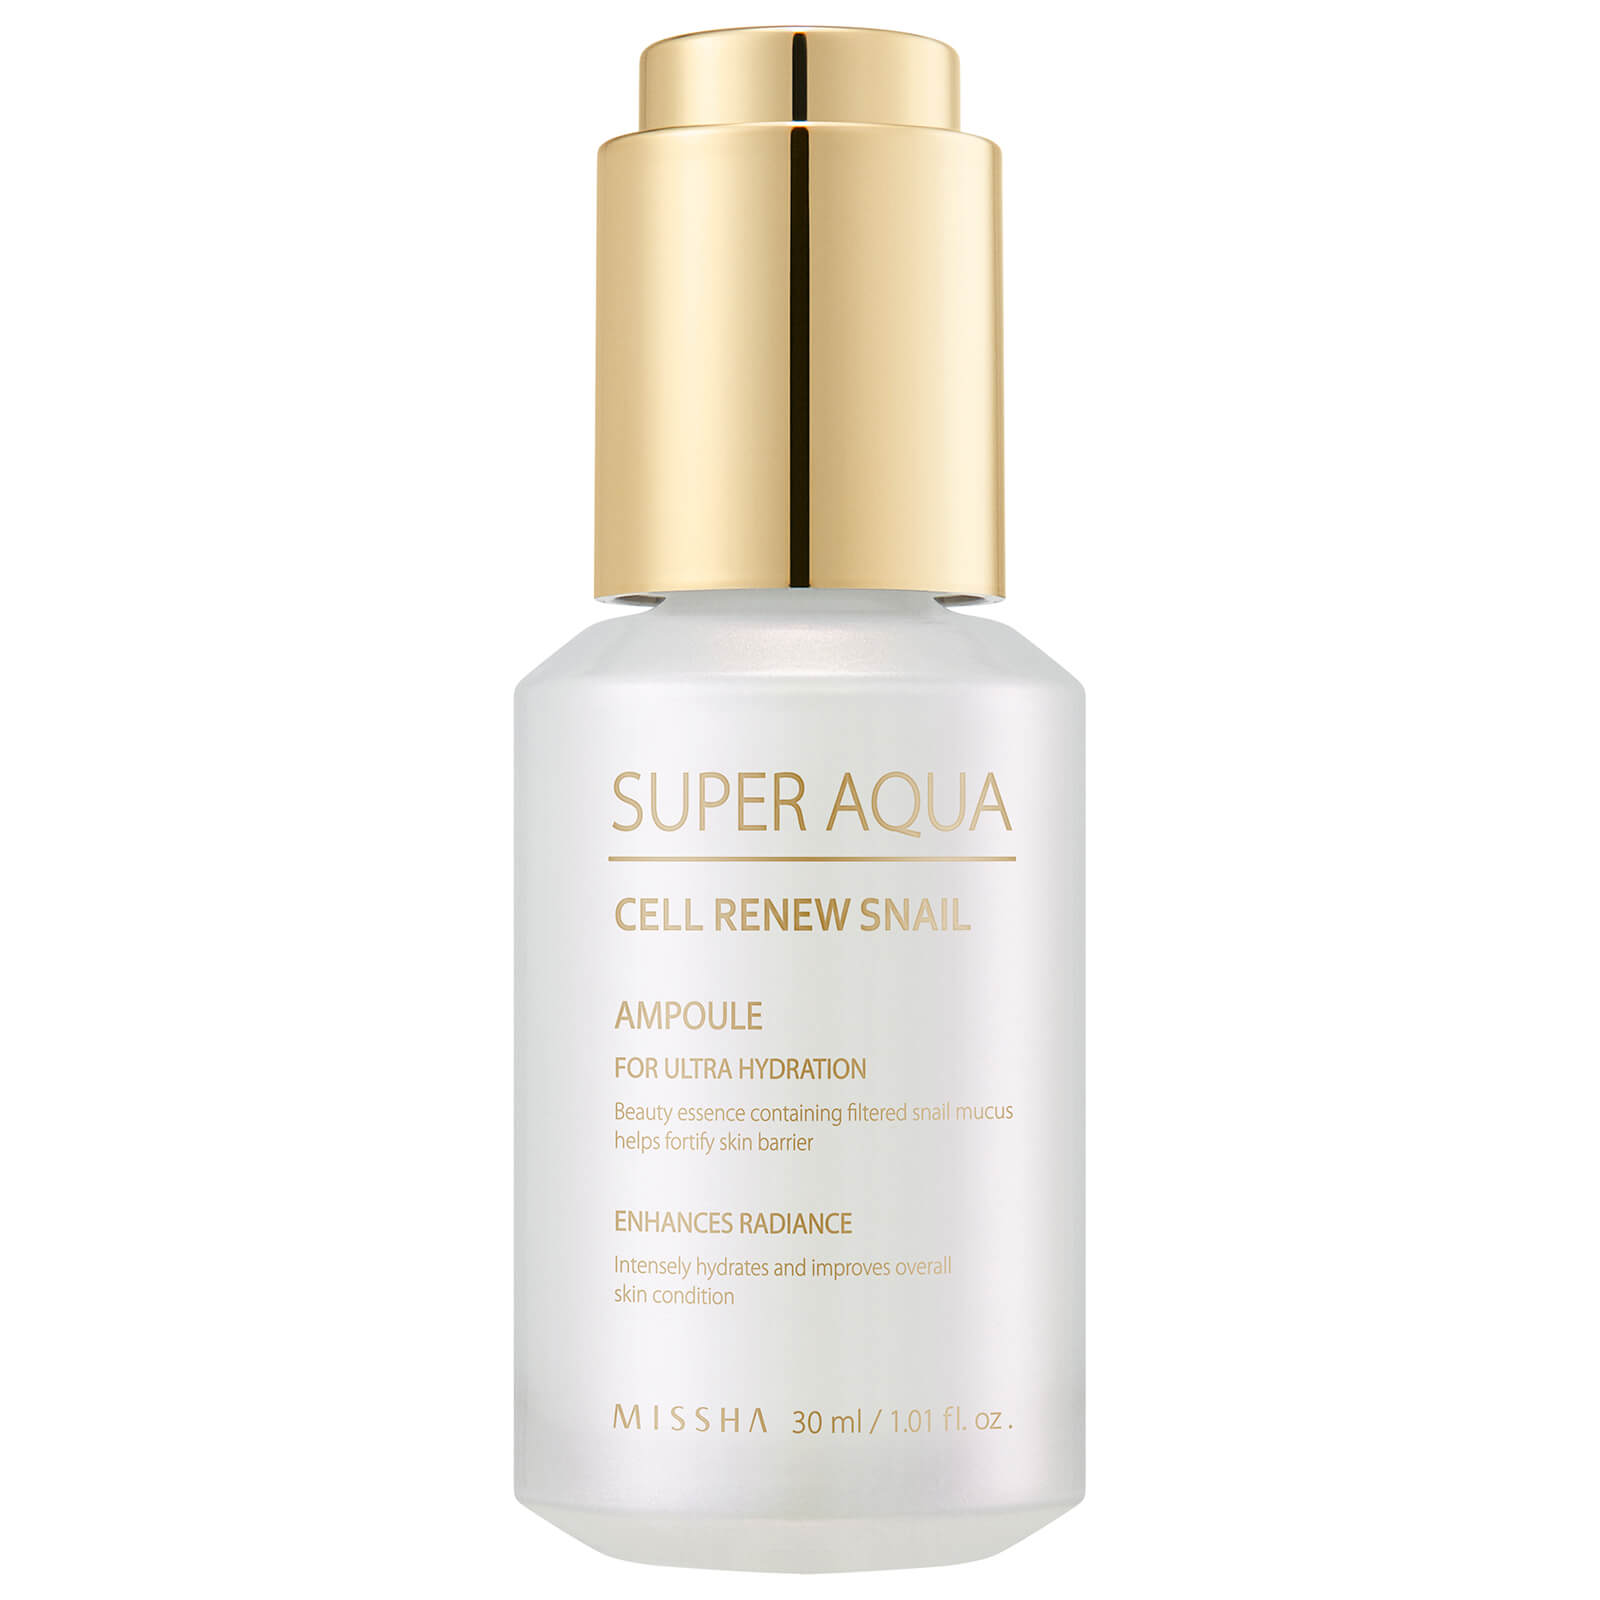 Купить MISSHA Super Aqua Cell Renew Snail Ampoule 30ml